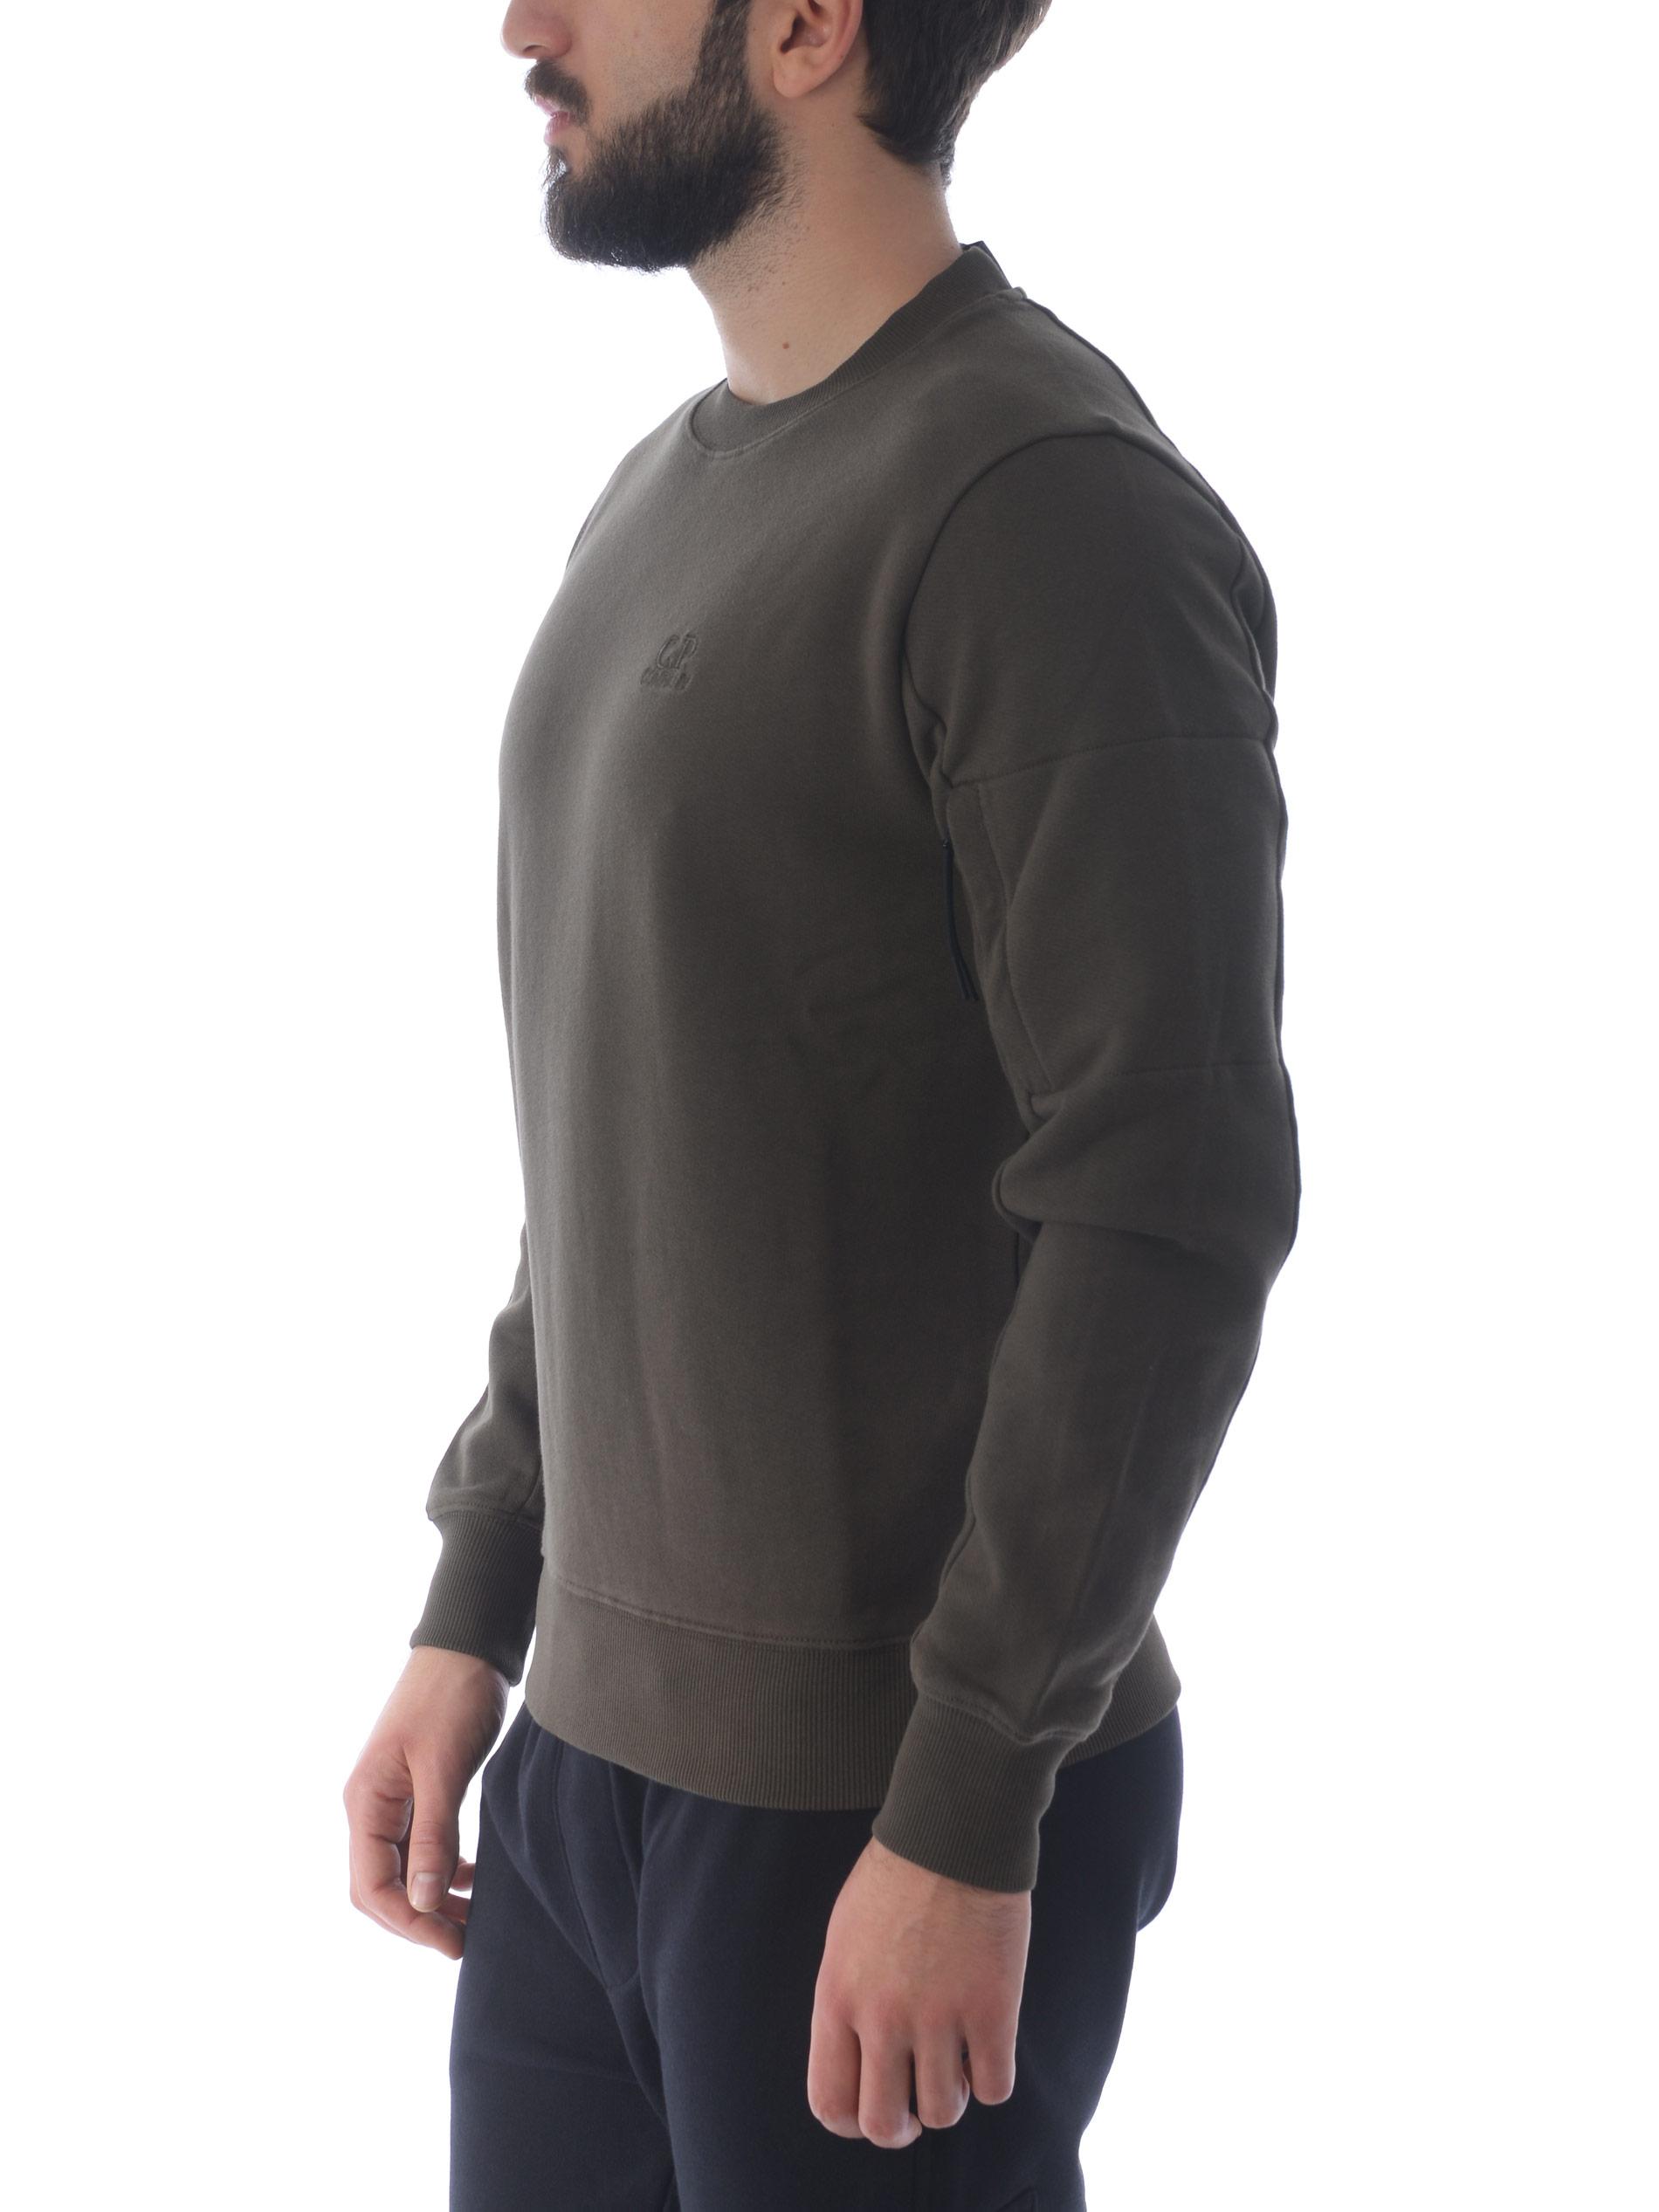 C.P. Company cotton sweatshirt C.P. COMPANY | 10000005 | MSS039B005086W-683